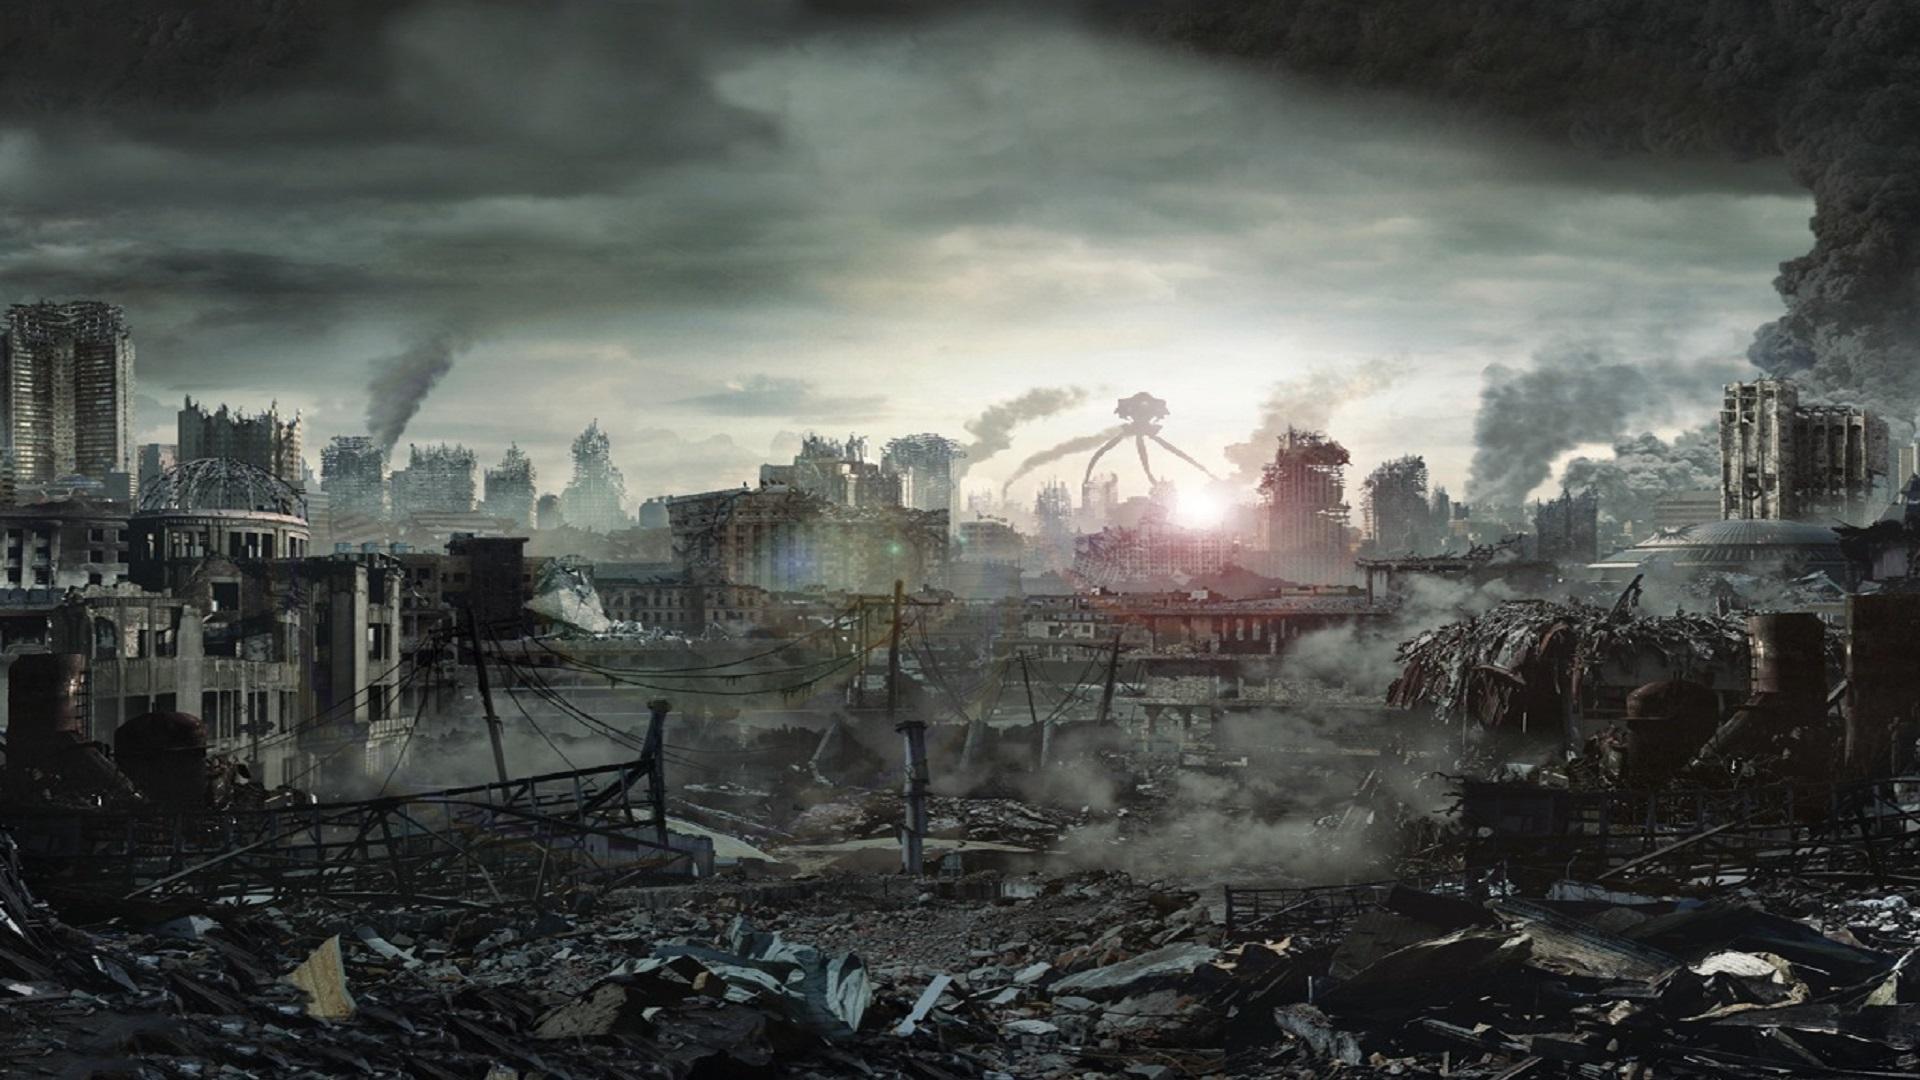 Apocalypsepost apocalyptic wallpapers   Album on Imgur 1920x1080